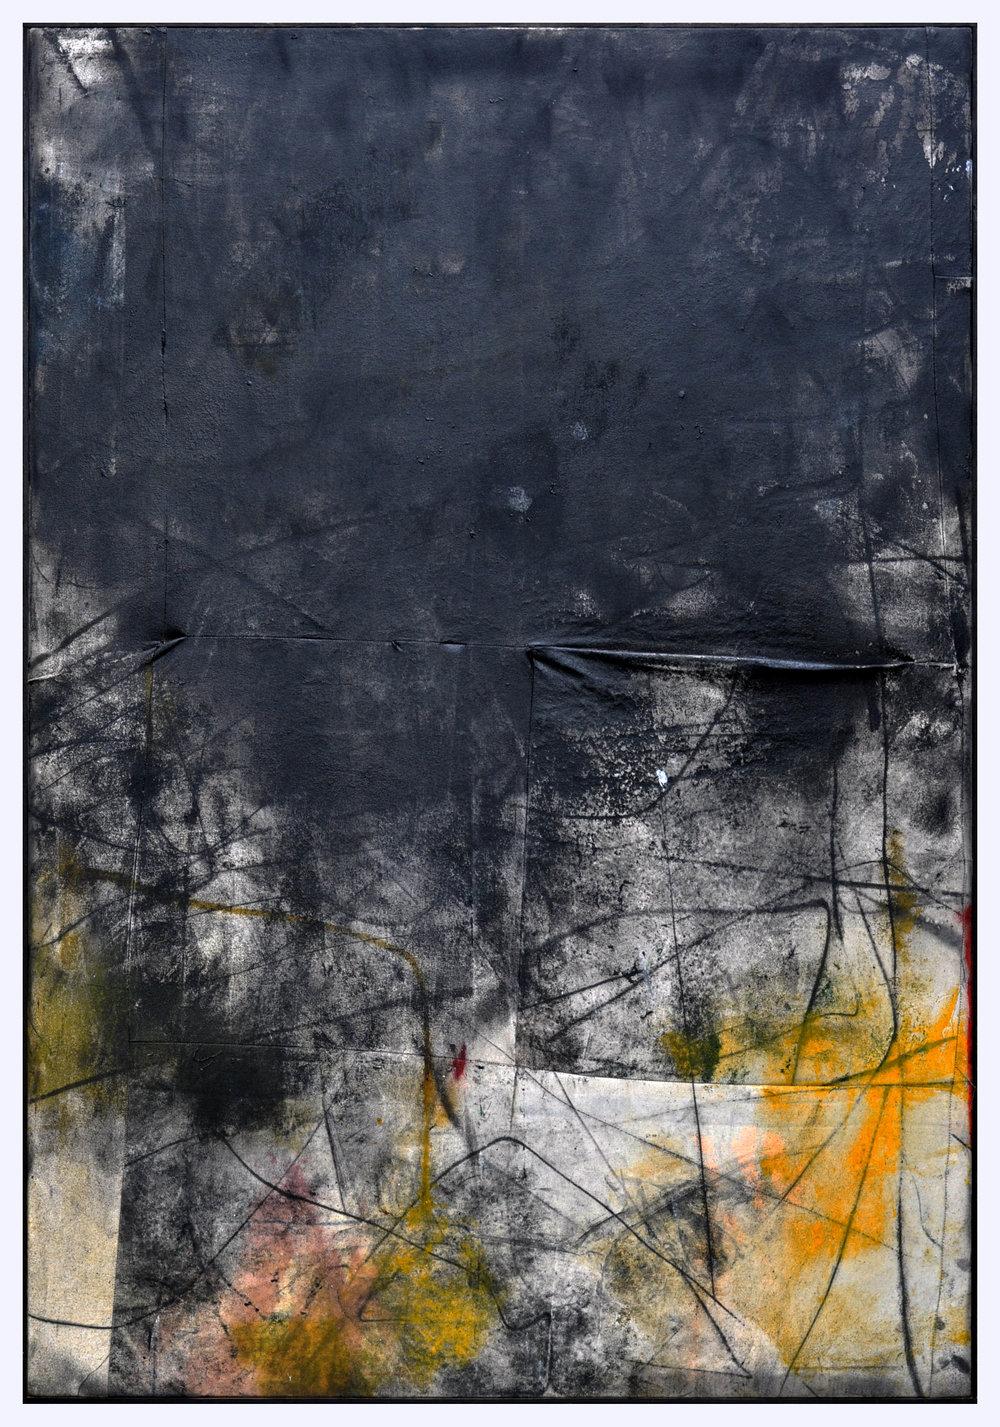 Ryan McGennisken, Nothin Aint Like Nothin 124 x 180 cm, spray paint, thred, on canvas, oak frame, available